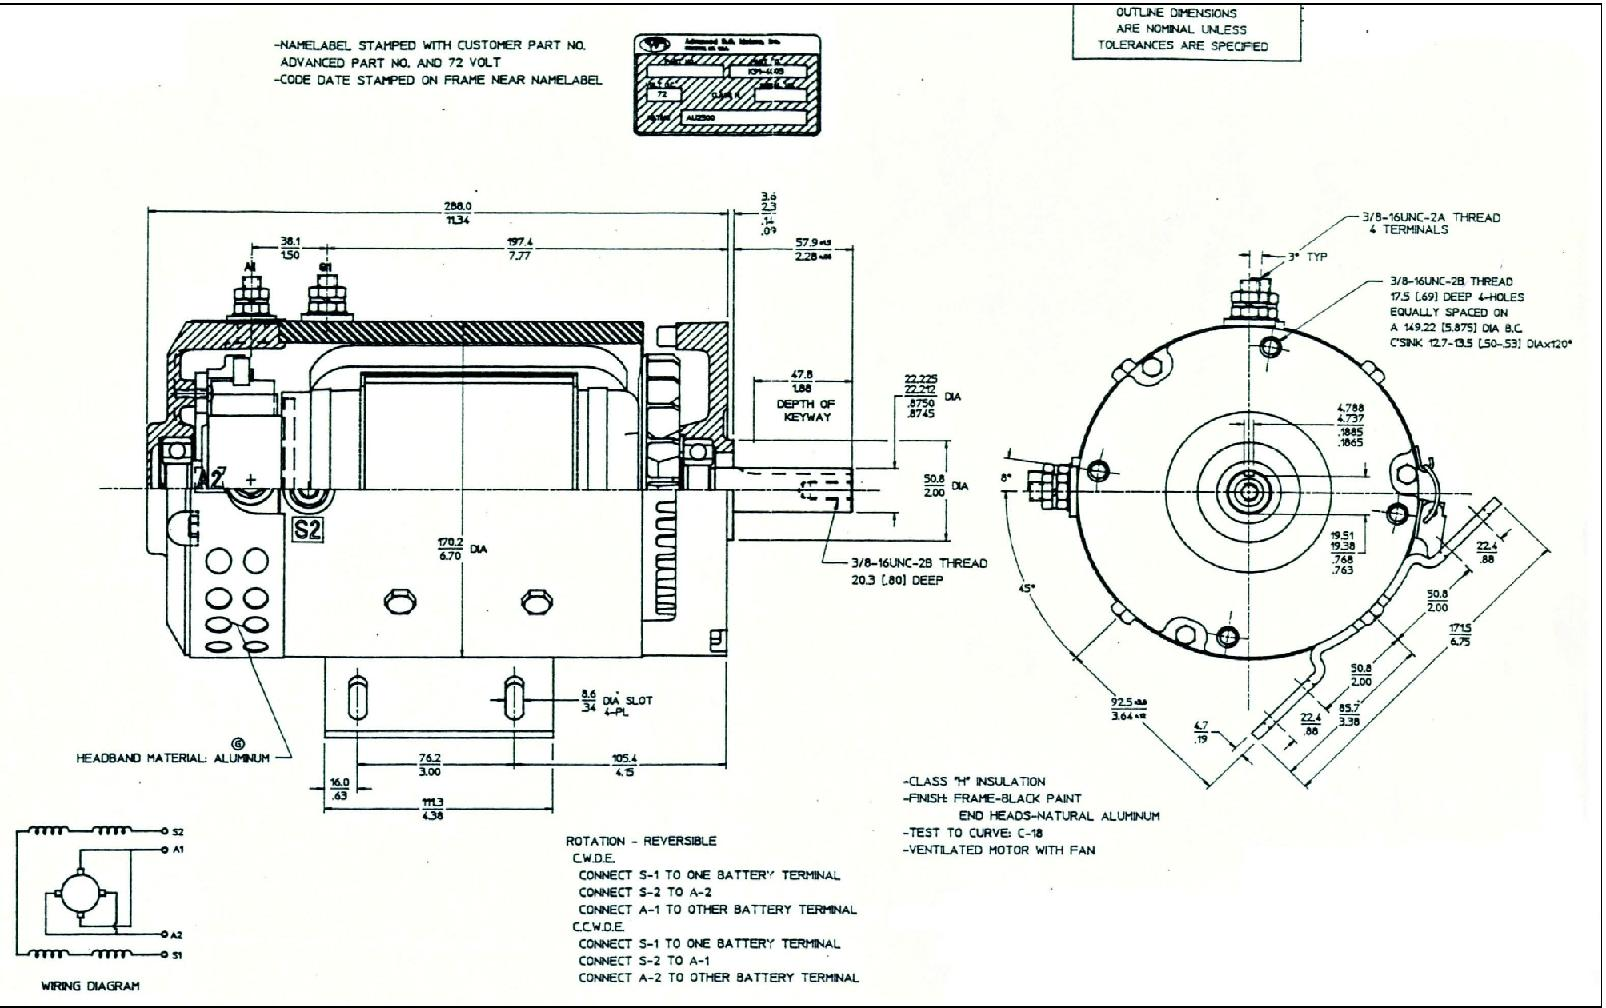 Bodine Motor Controller Schematic Motor Drive Schematic